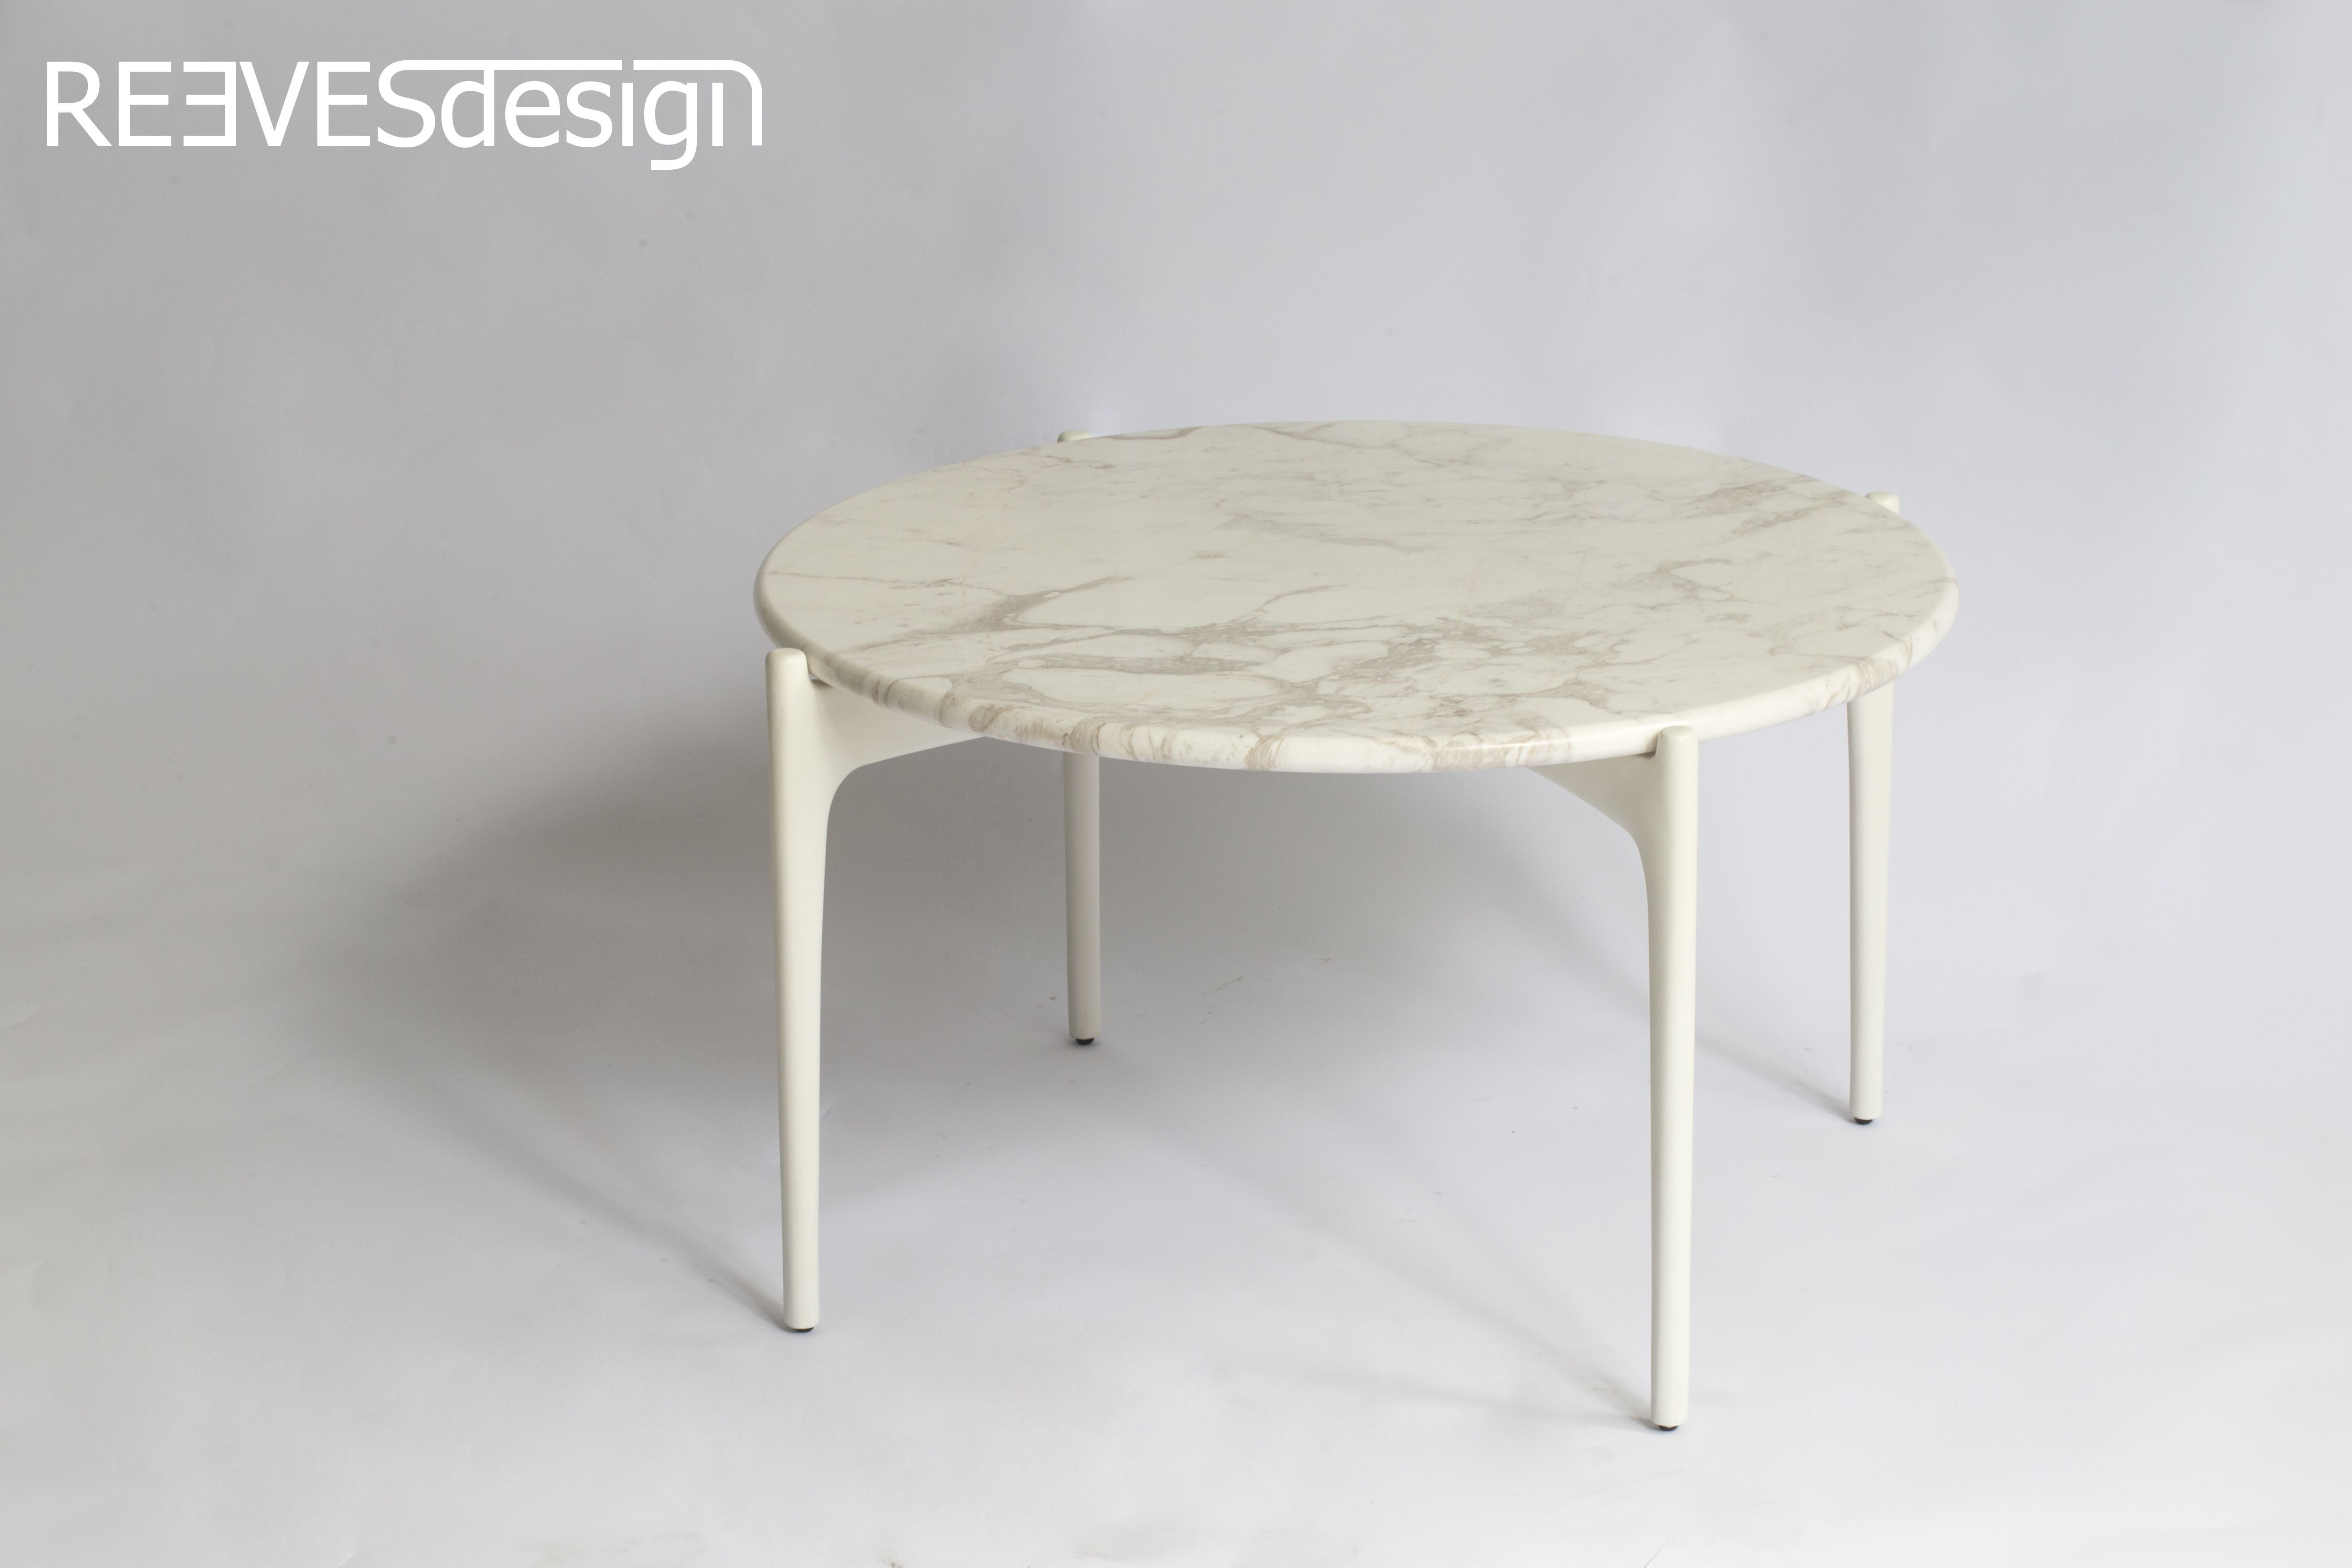 Beautiful Geometric Round Coffee Table Designed By John Reeves - Geometric round coffee table